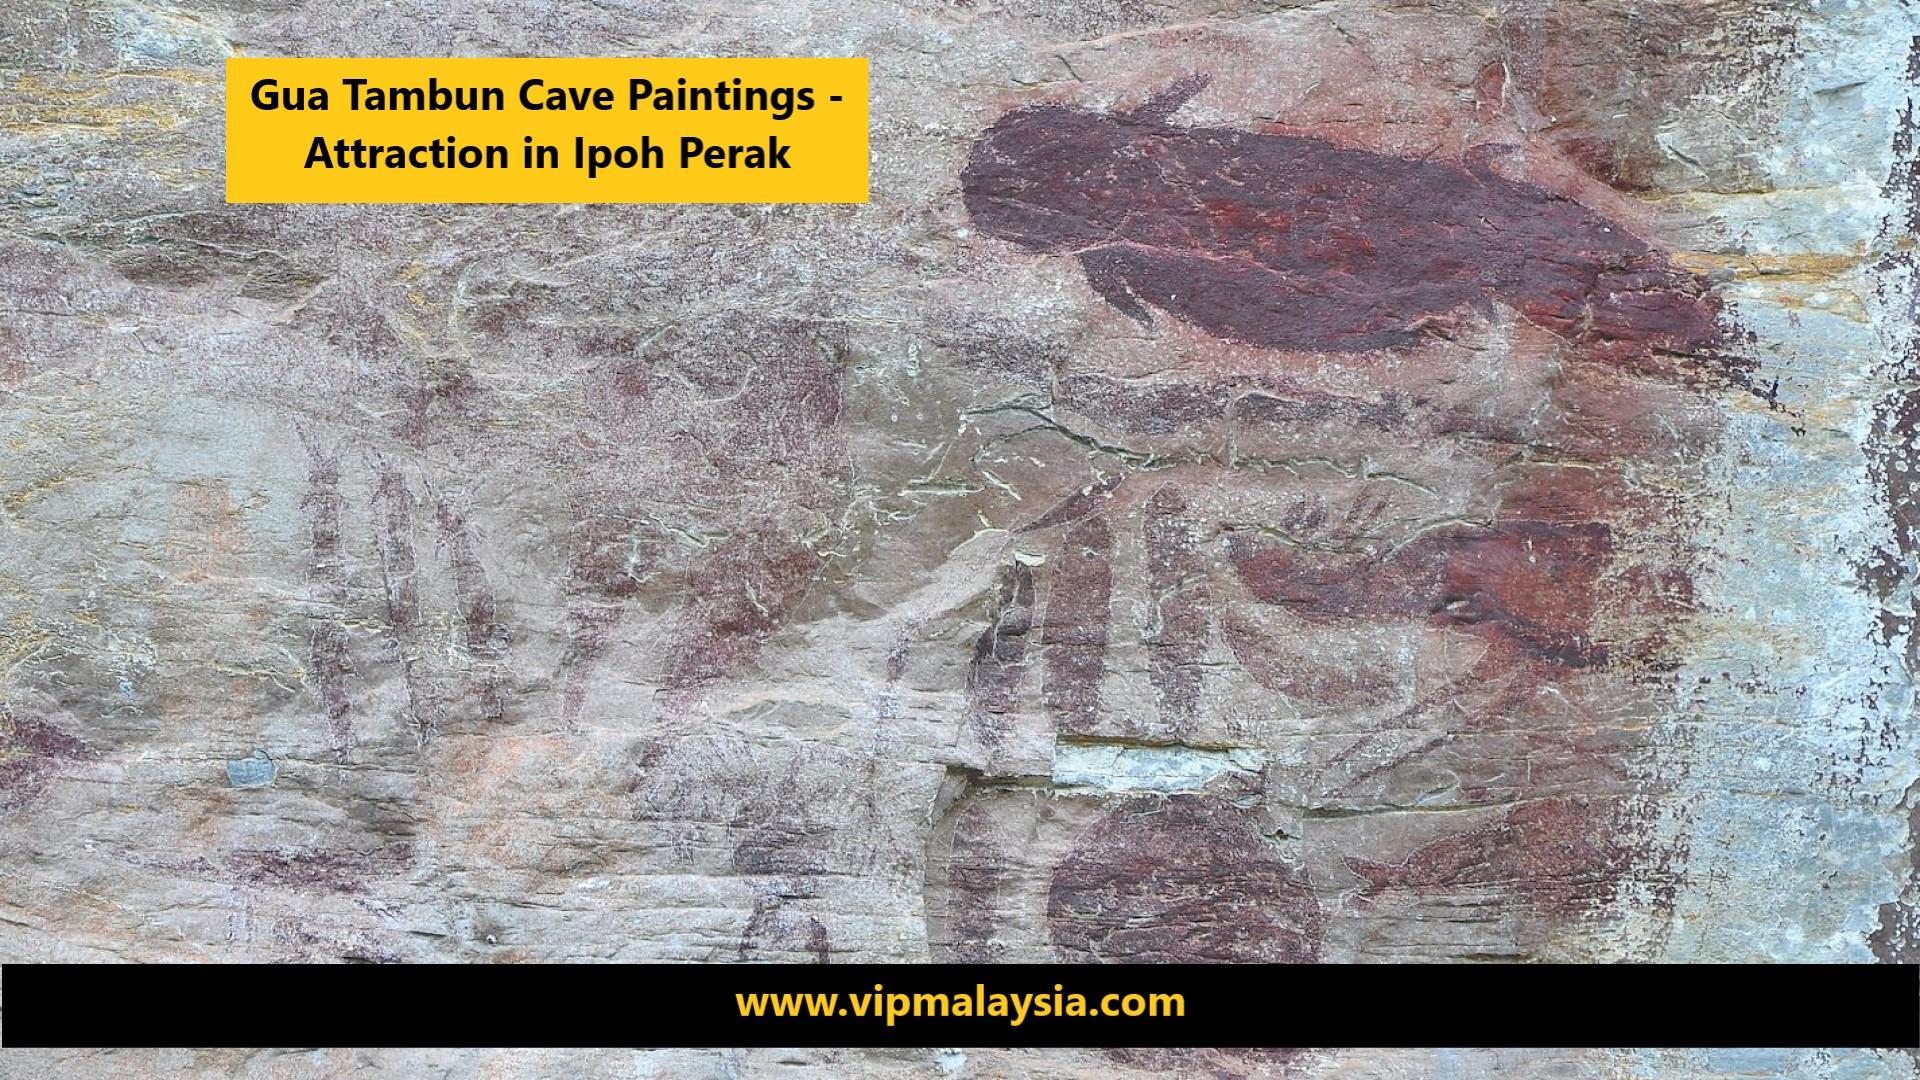 Gua Tambun Cave Painting Tourist Attraction in Ipoh Perak Malaysia